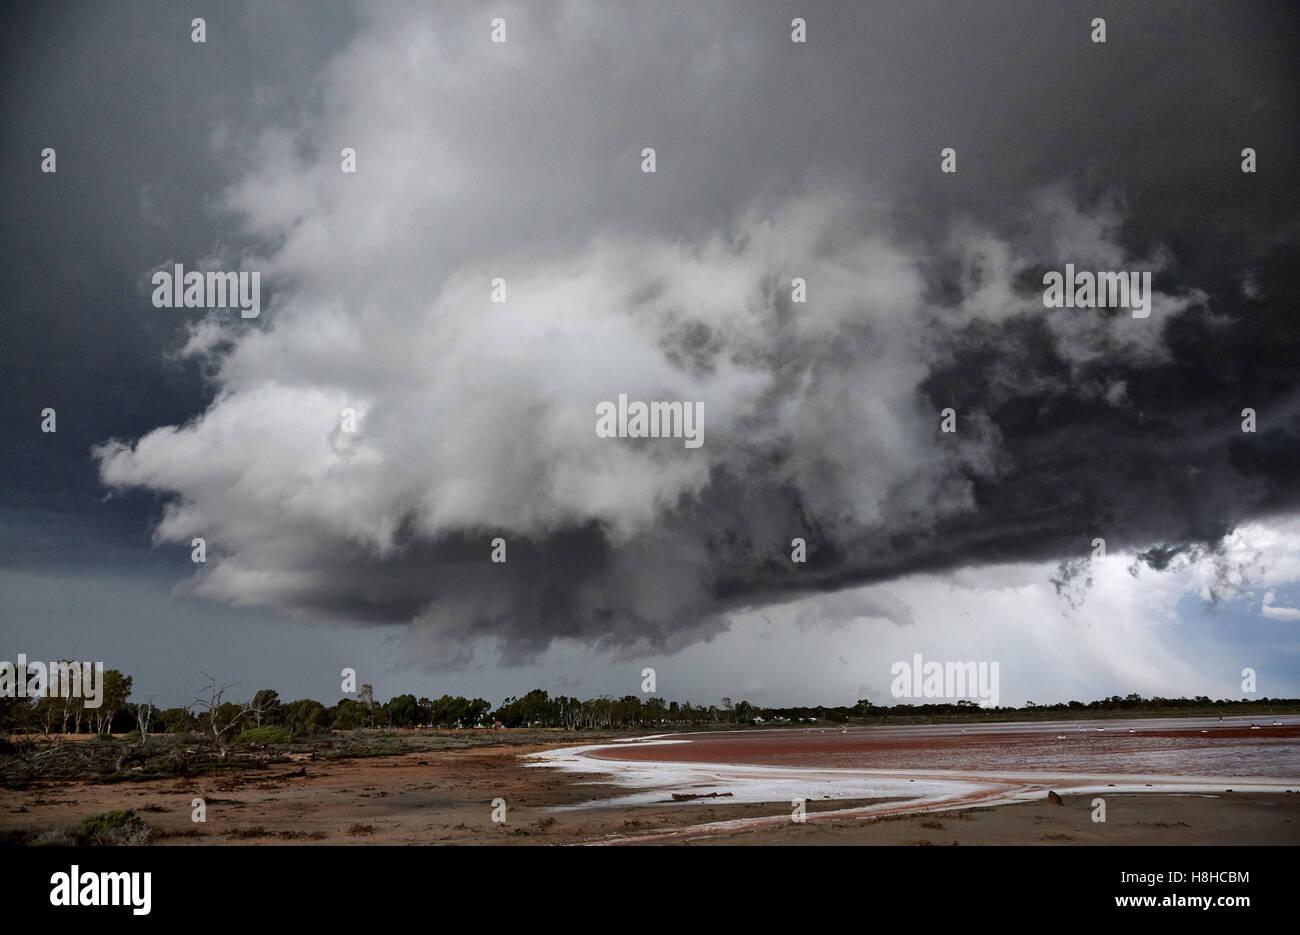 Damaging thunderstorm forming of salt lake near Mildura, Victoria, Australia - Stock Image